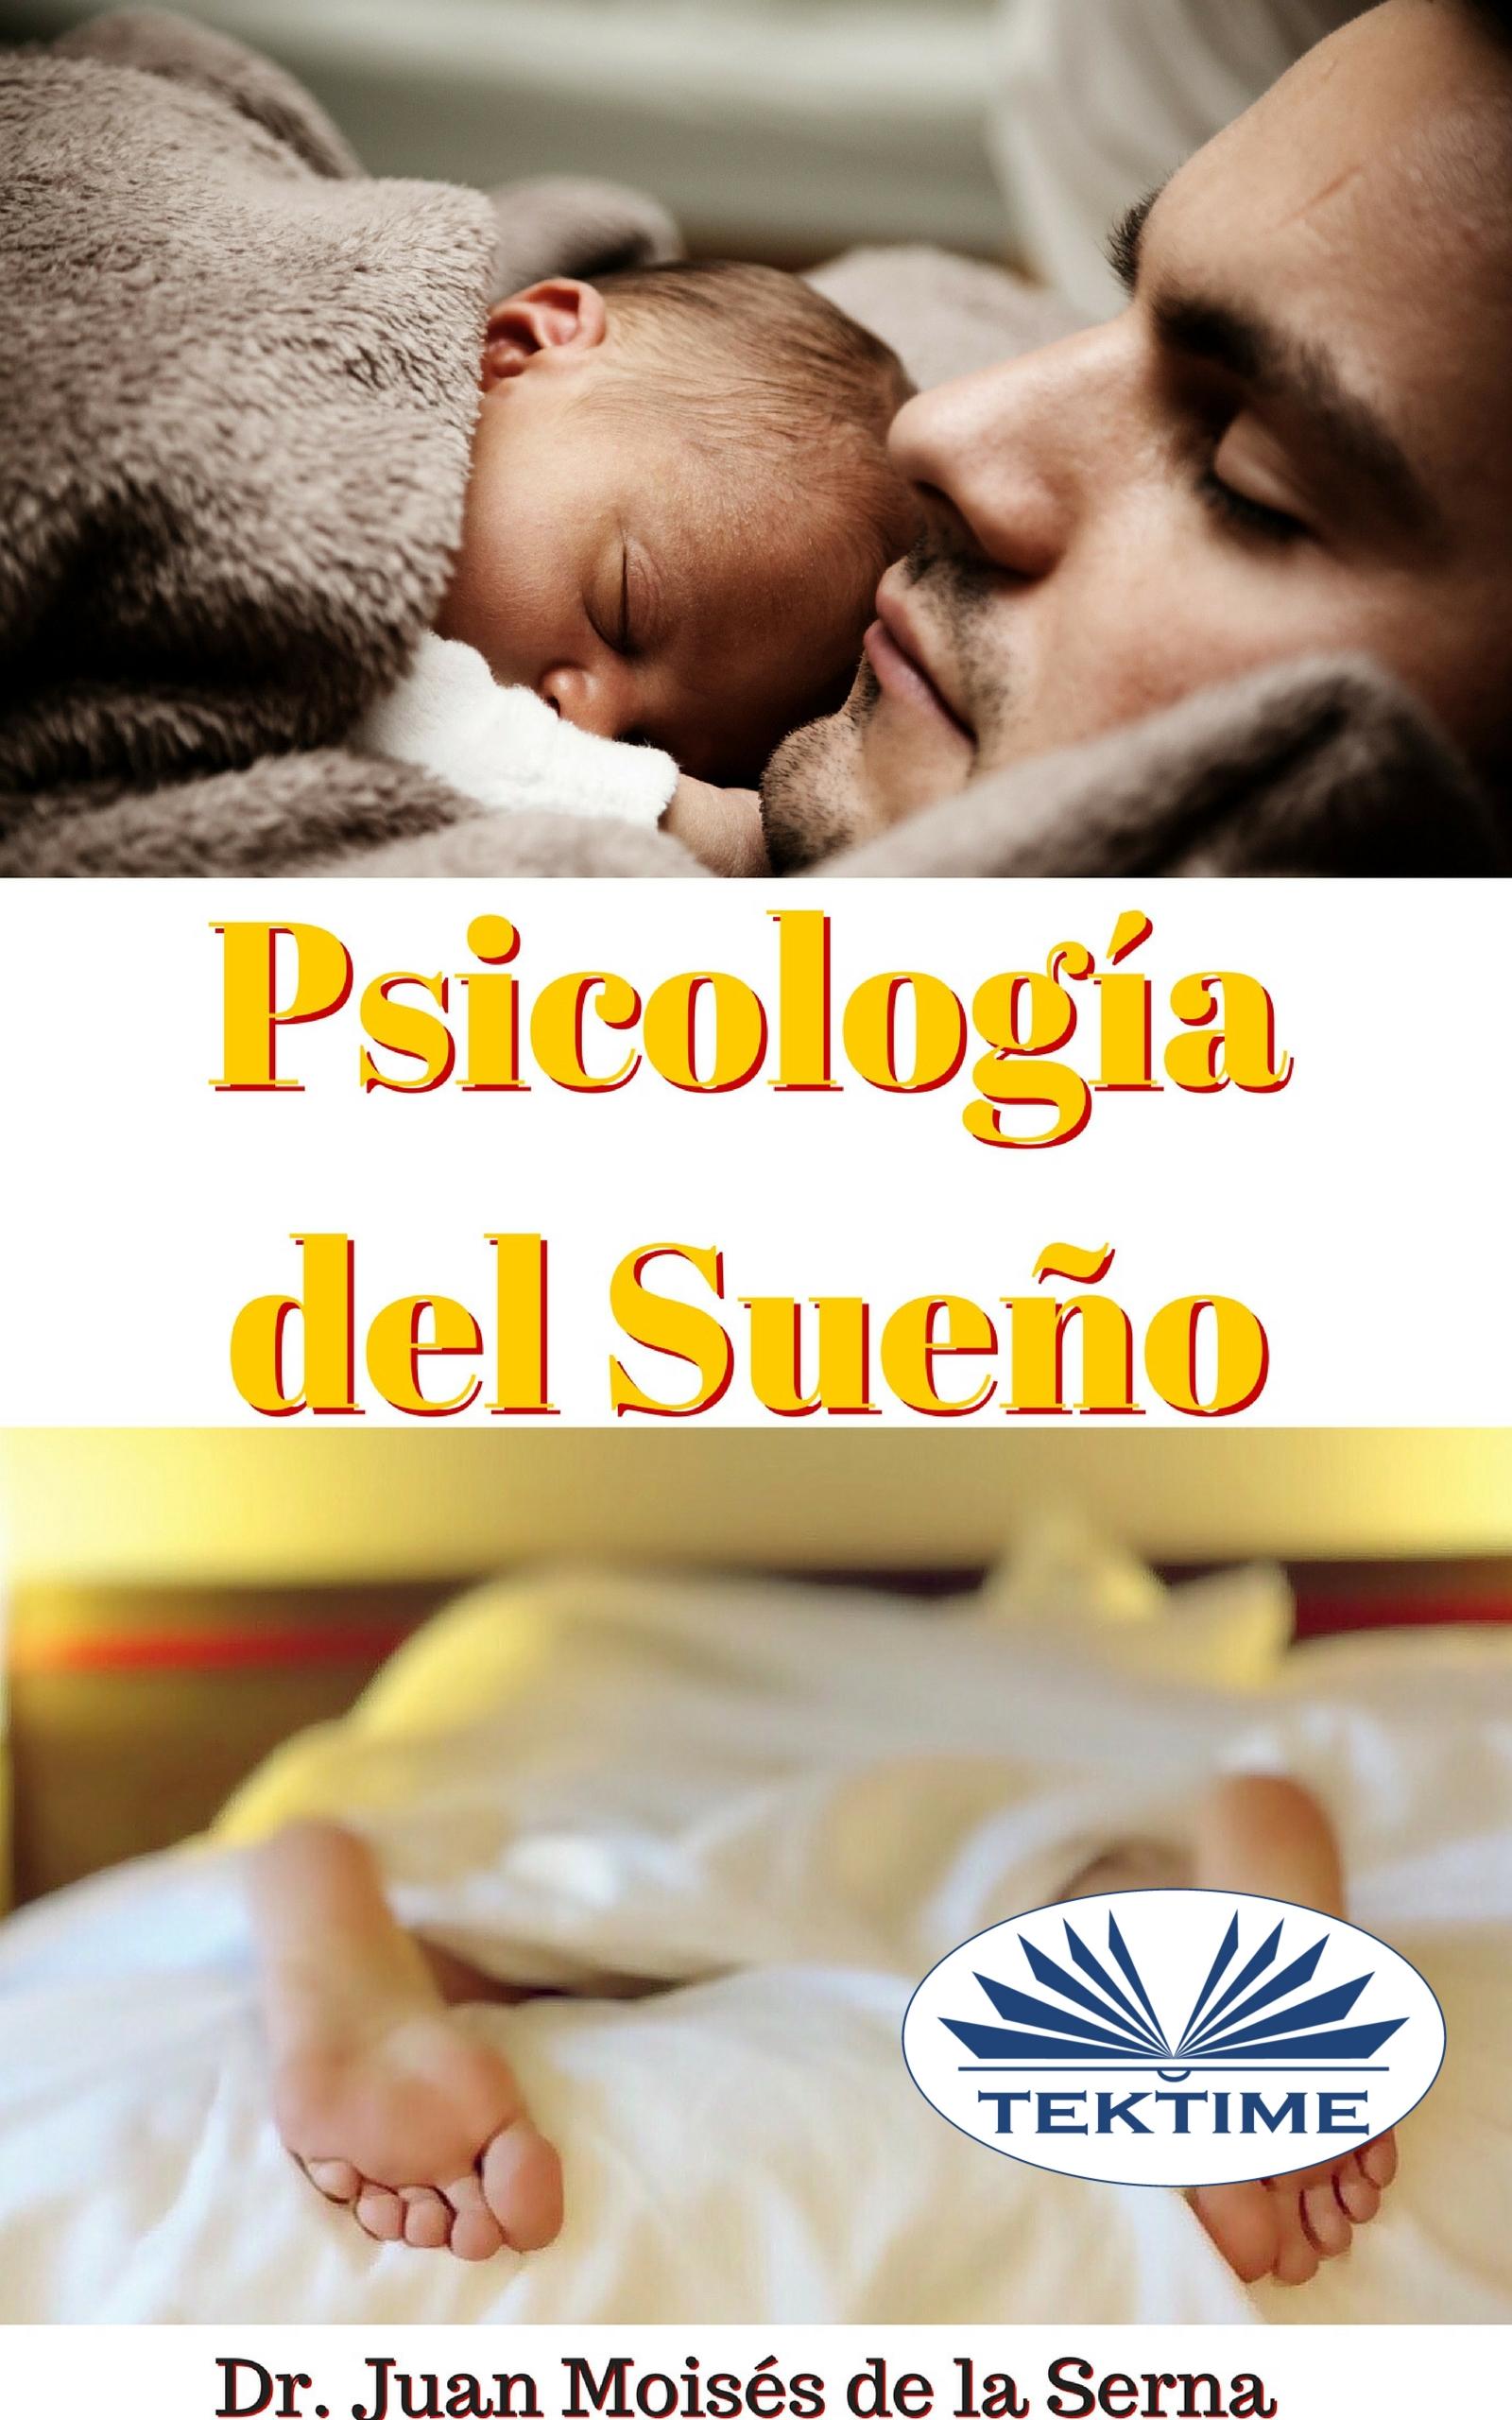 Juan Moisés De La Serna Psicología Del Sueño dr juan moisés de la serna versos infantiles